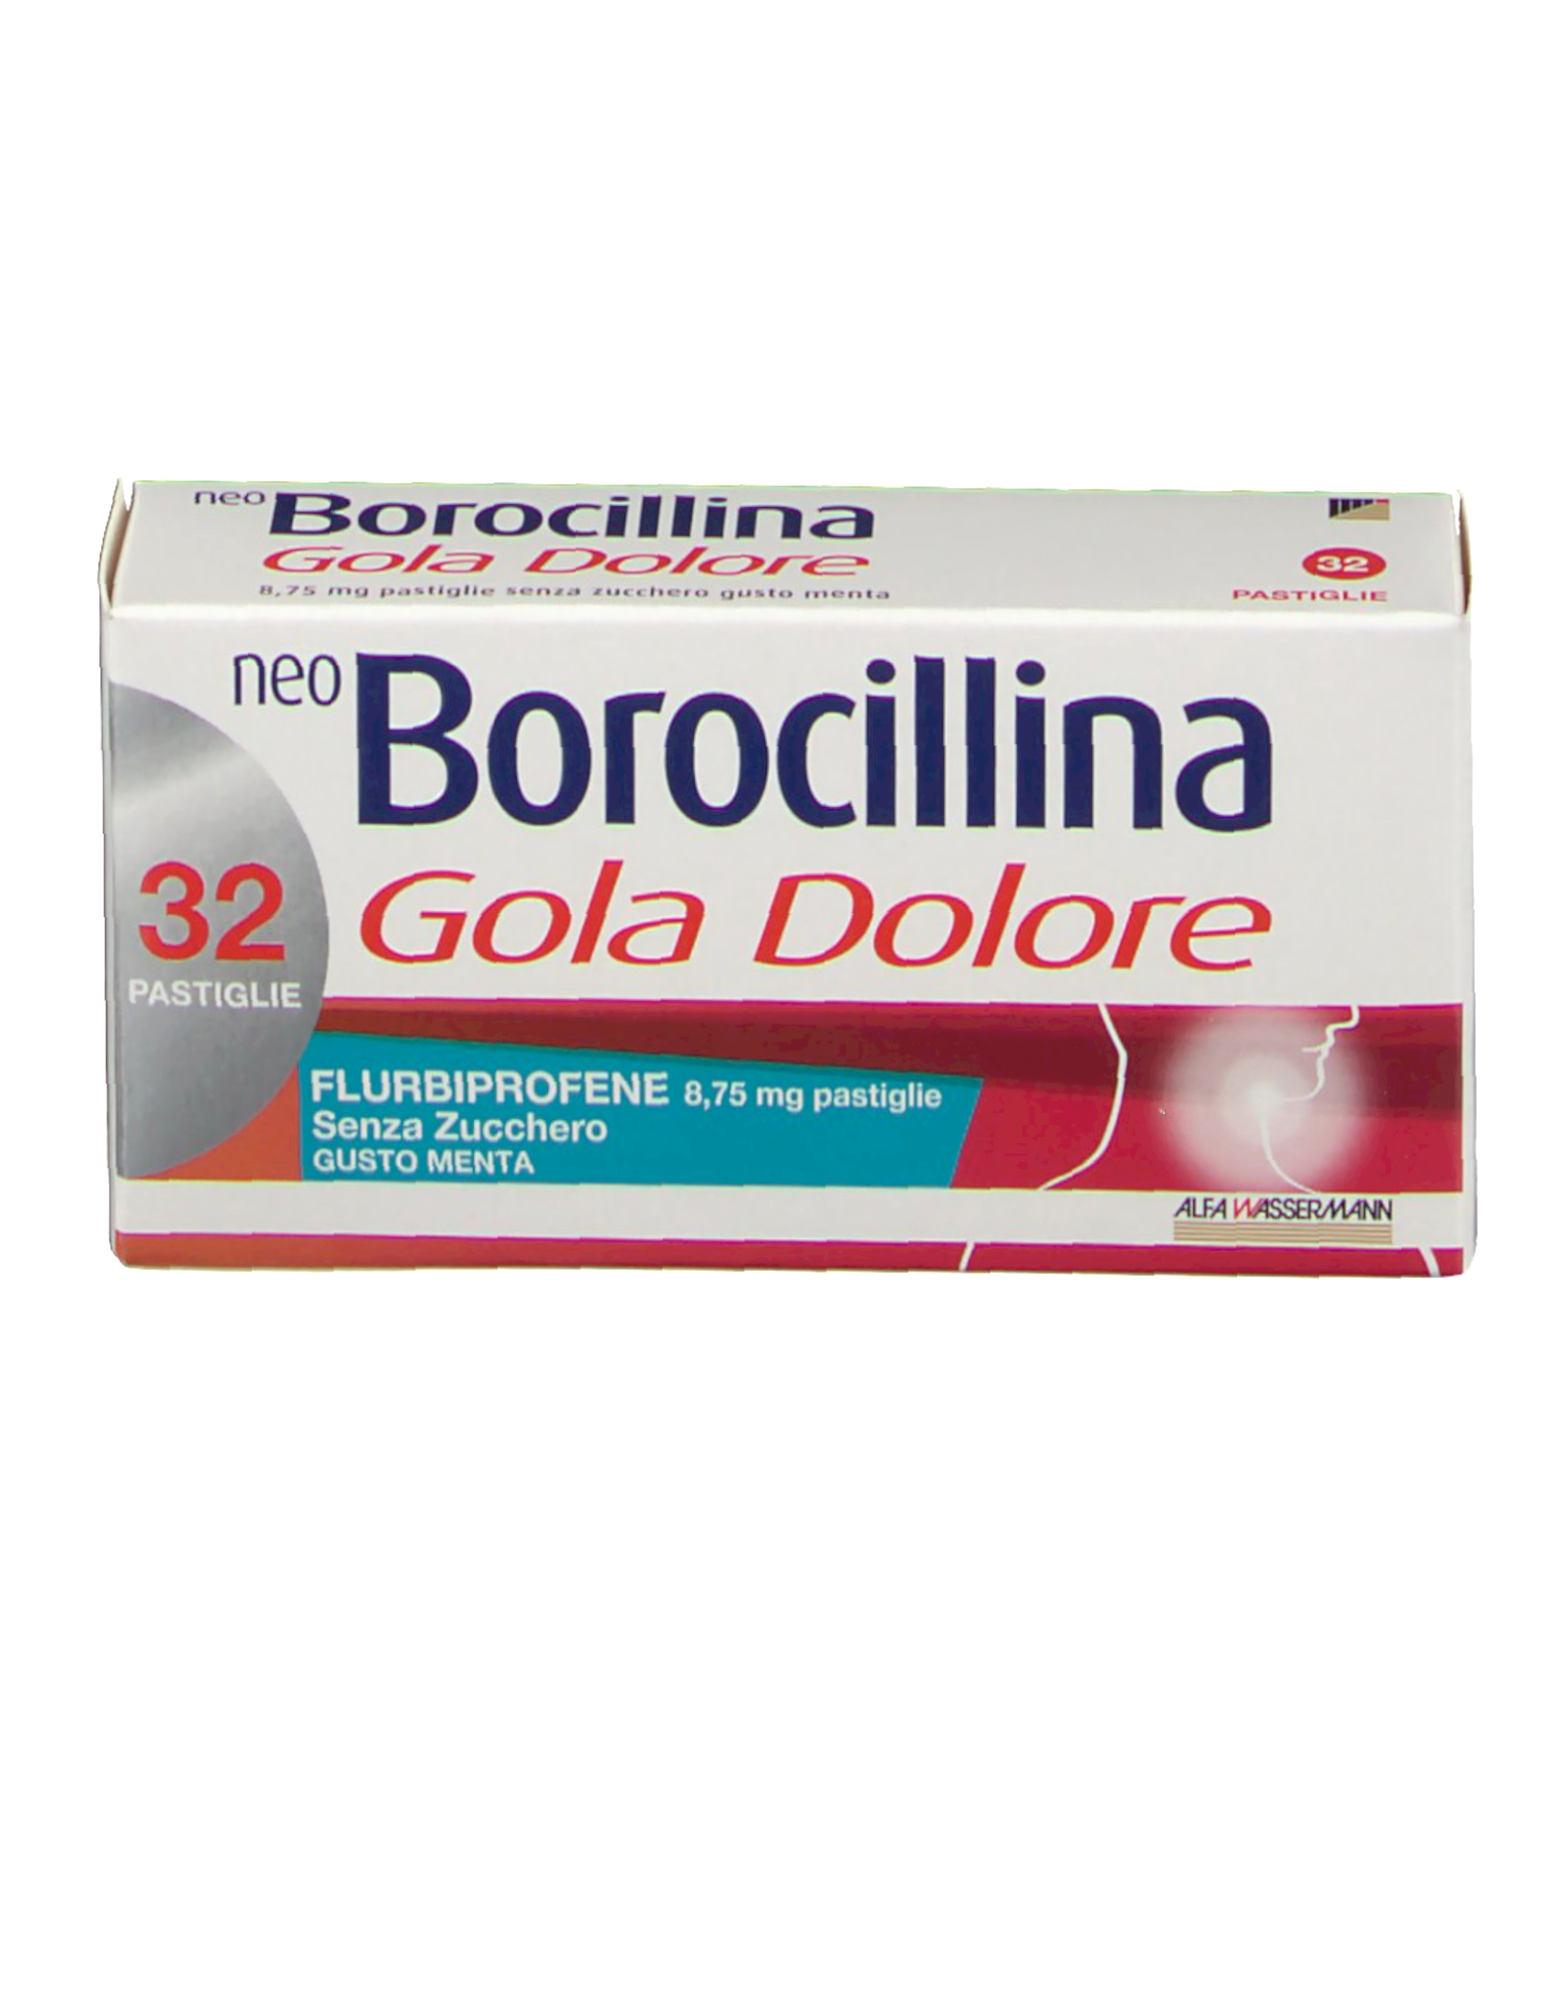 NeoBorocillina Gola Dolore 8,75 mg - 32 pastiglie senza zucchero-Gusto Menta